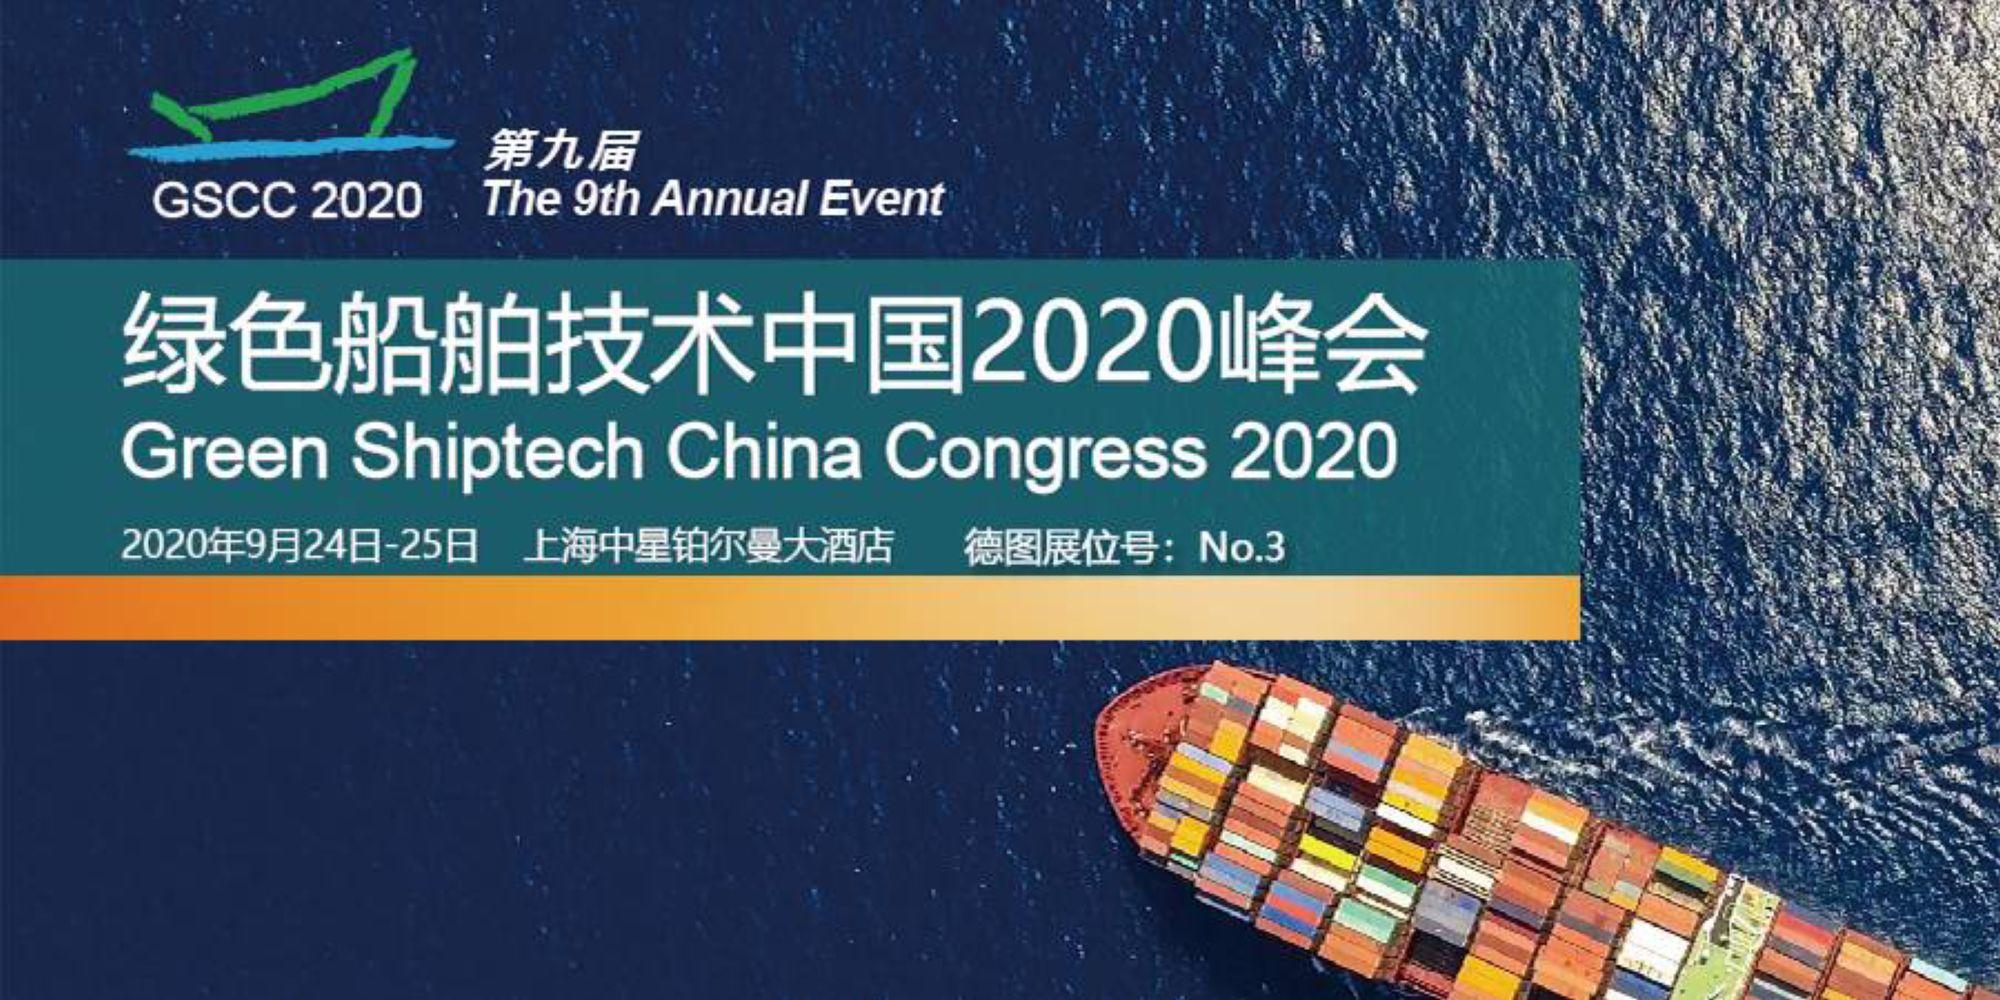 CN-GreenShiptechChina2020-invite-900x450.jpg